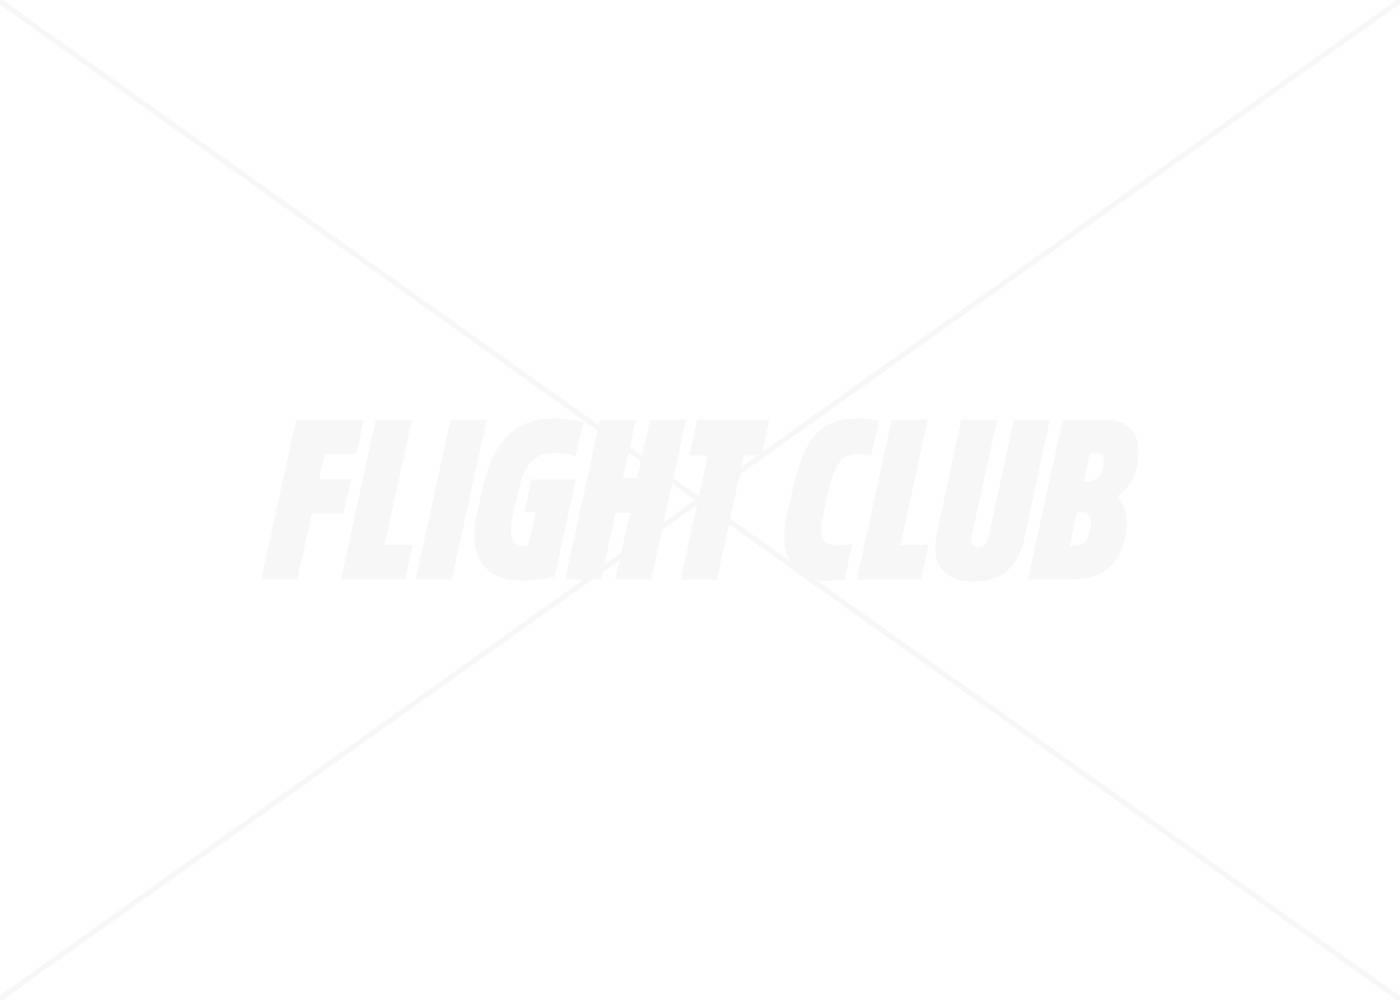 d25b25e4c8e1 Air Jordan 3 Retro